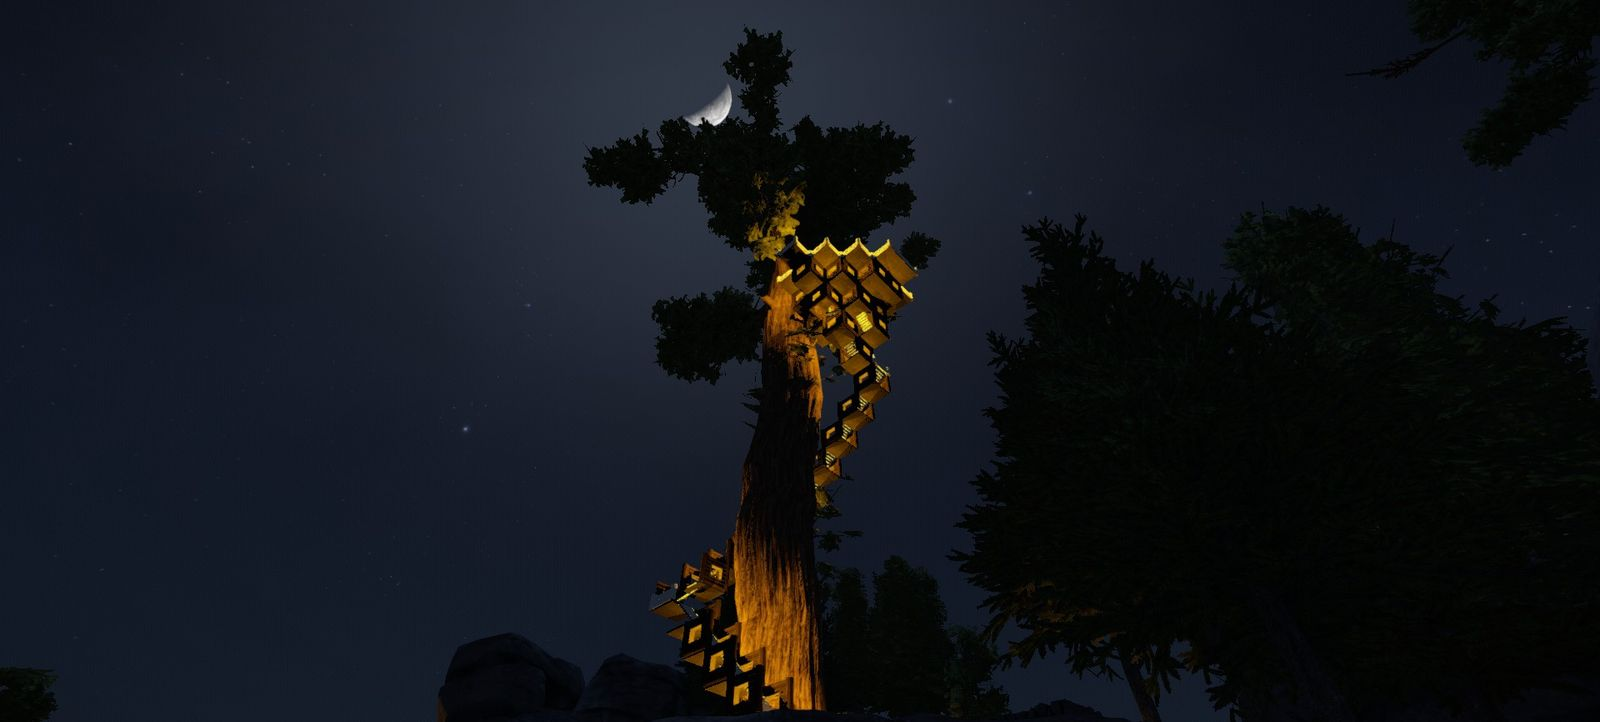 Деревяшко в ночи